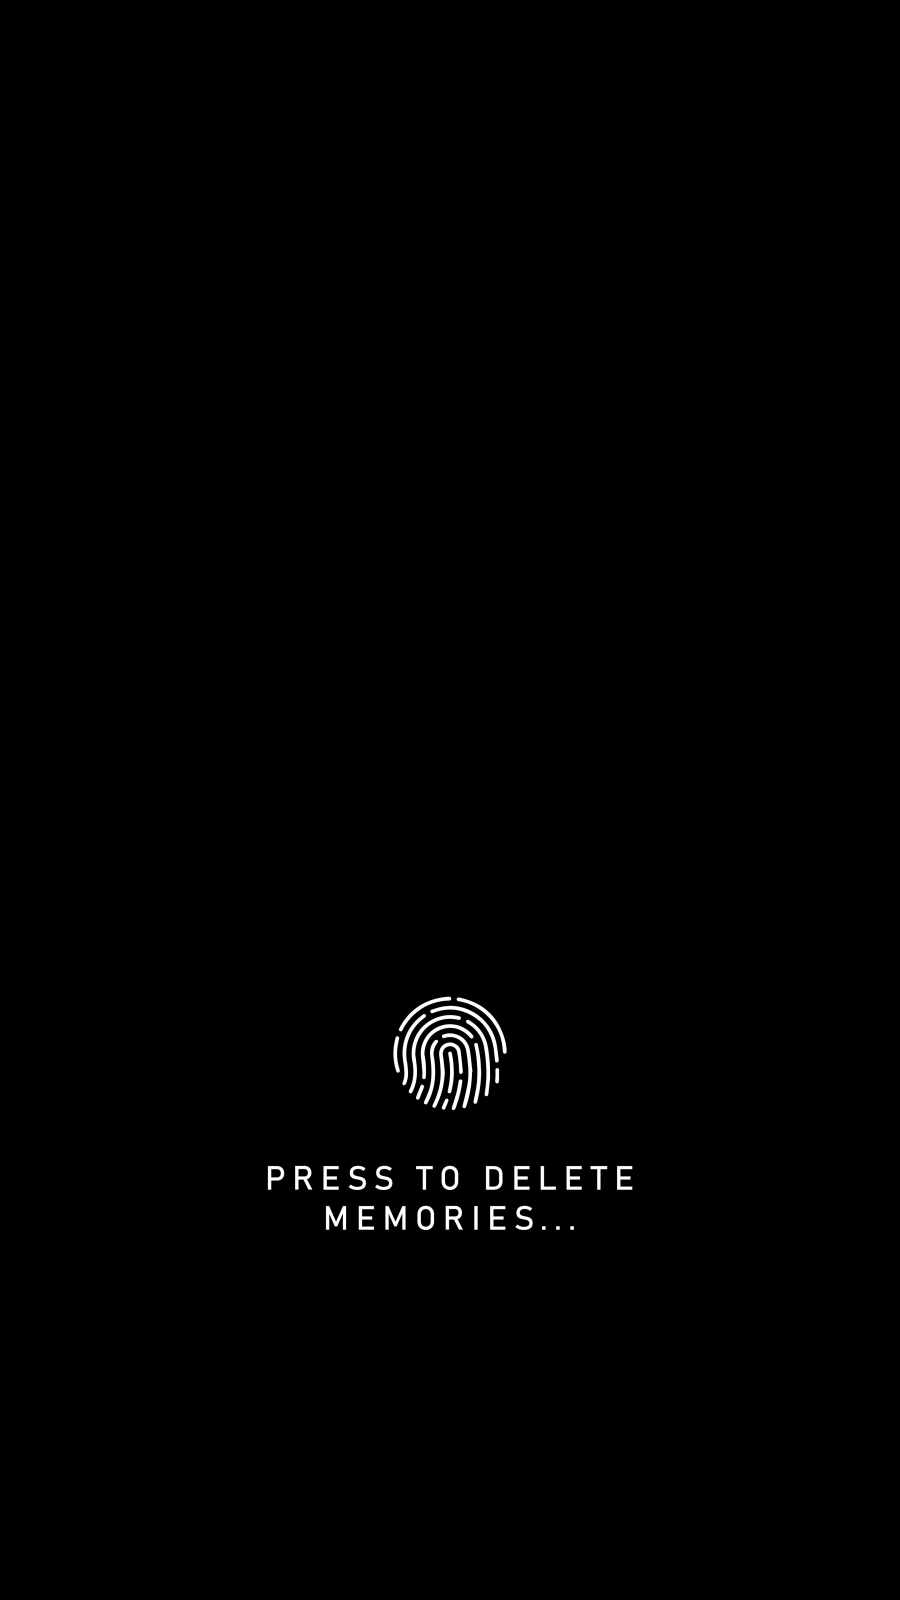 Press to Delete Memories